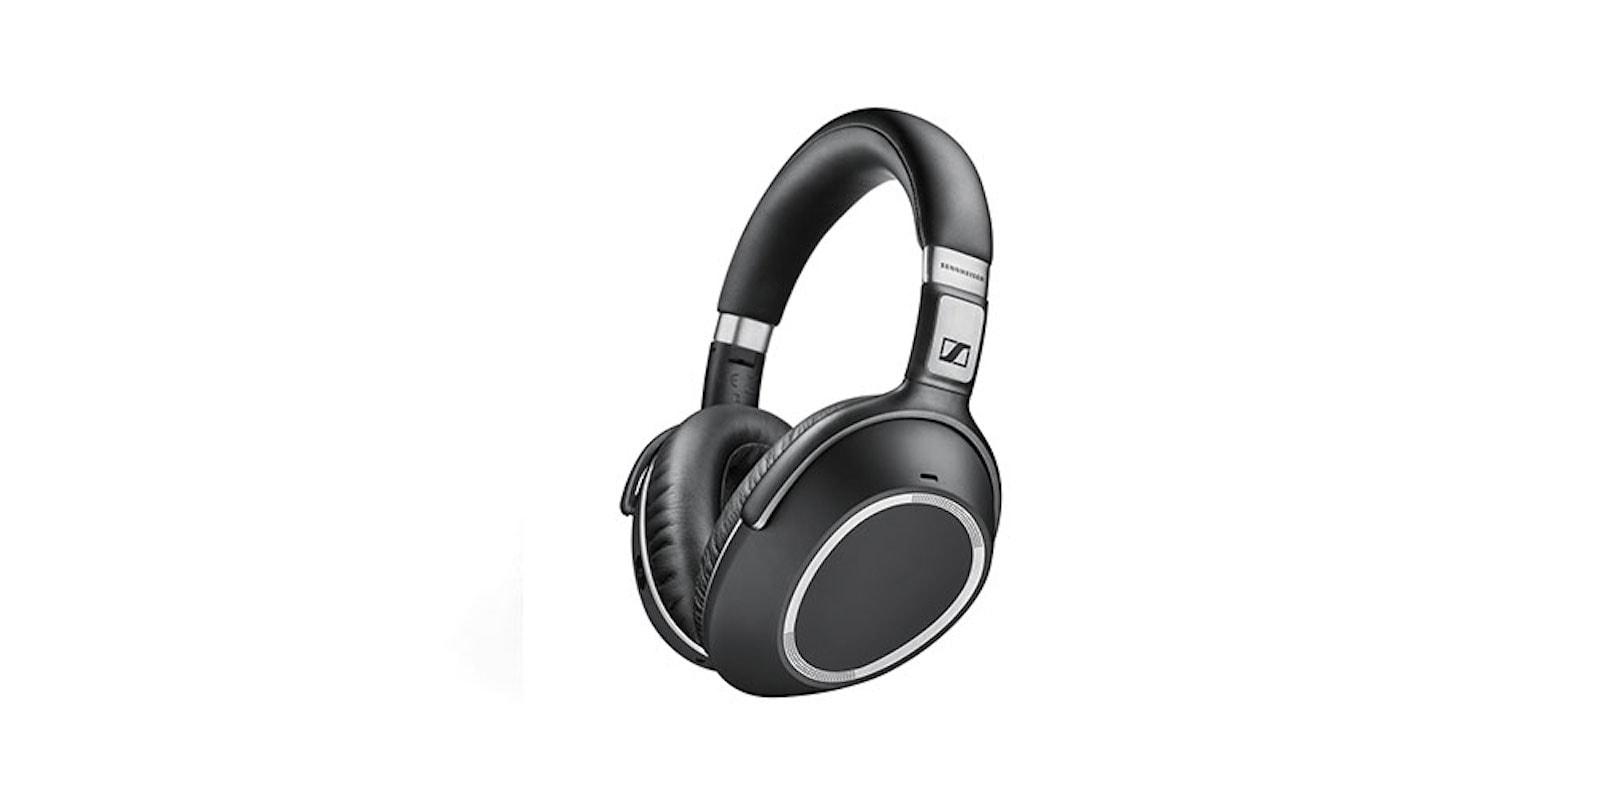 Sennheiser PXC 550 Over-Ear Bluetooth ANC Headphones